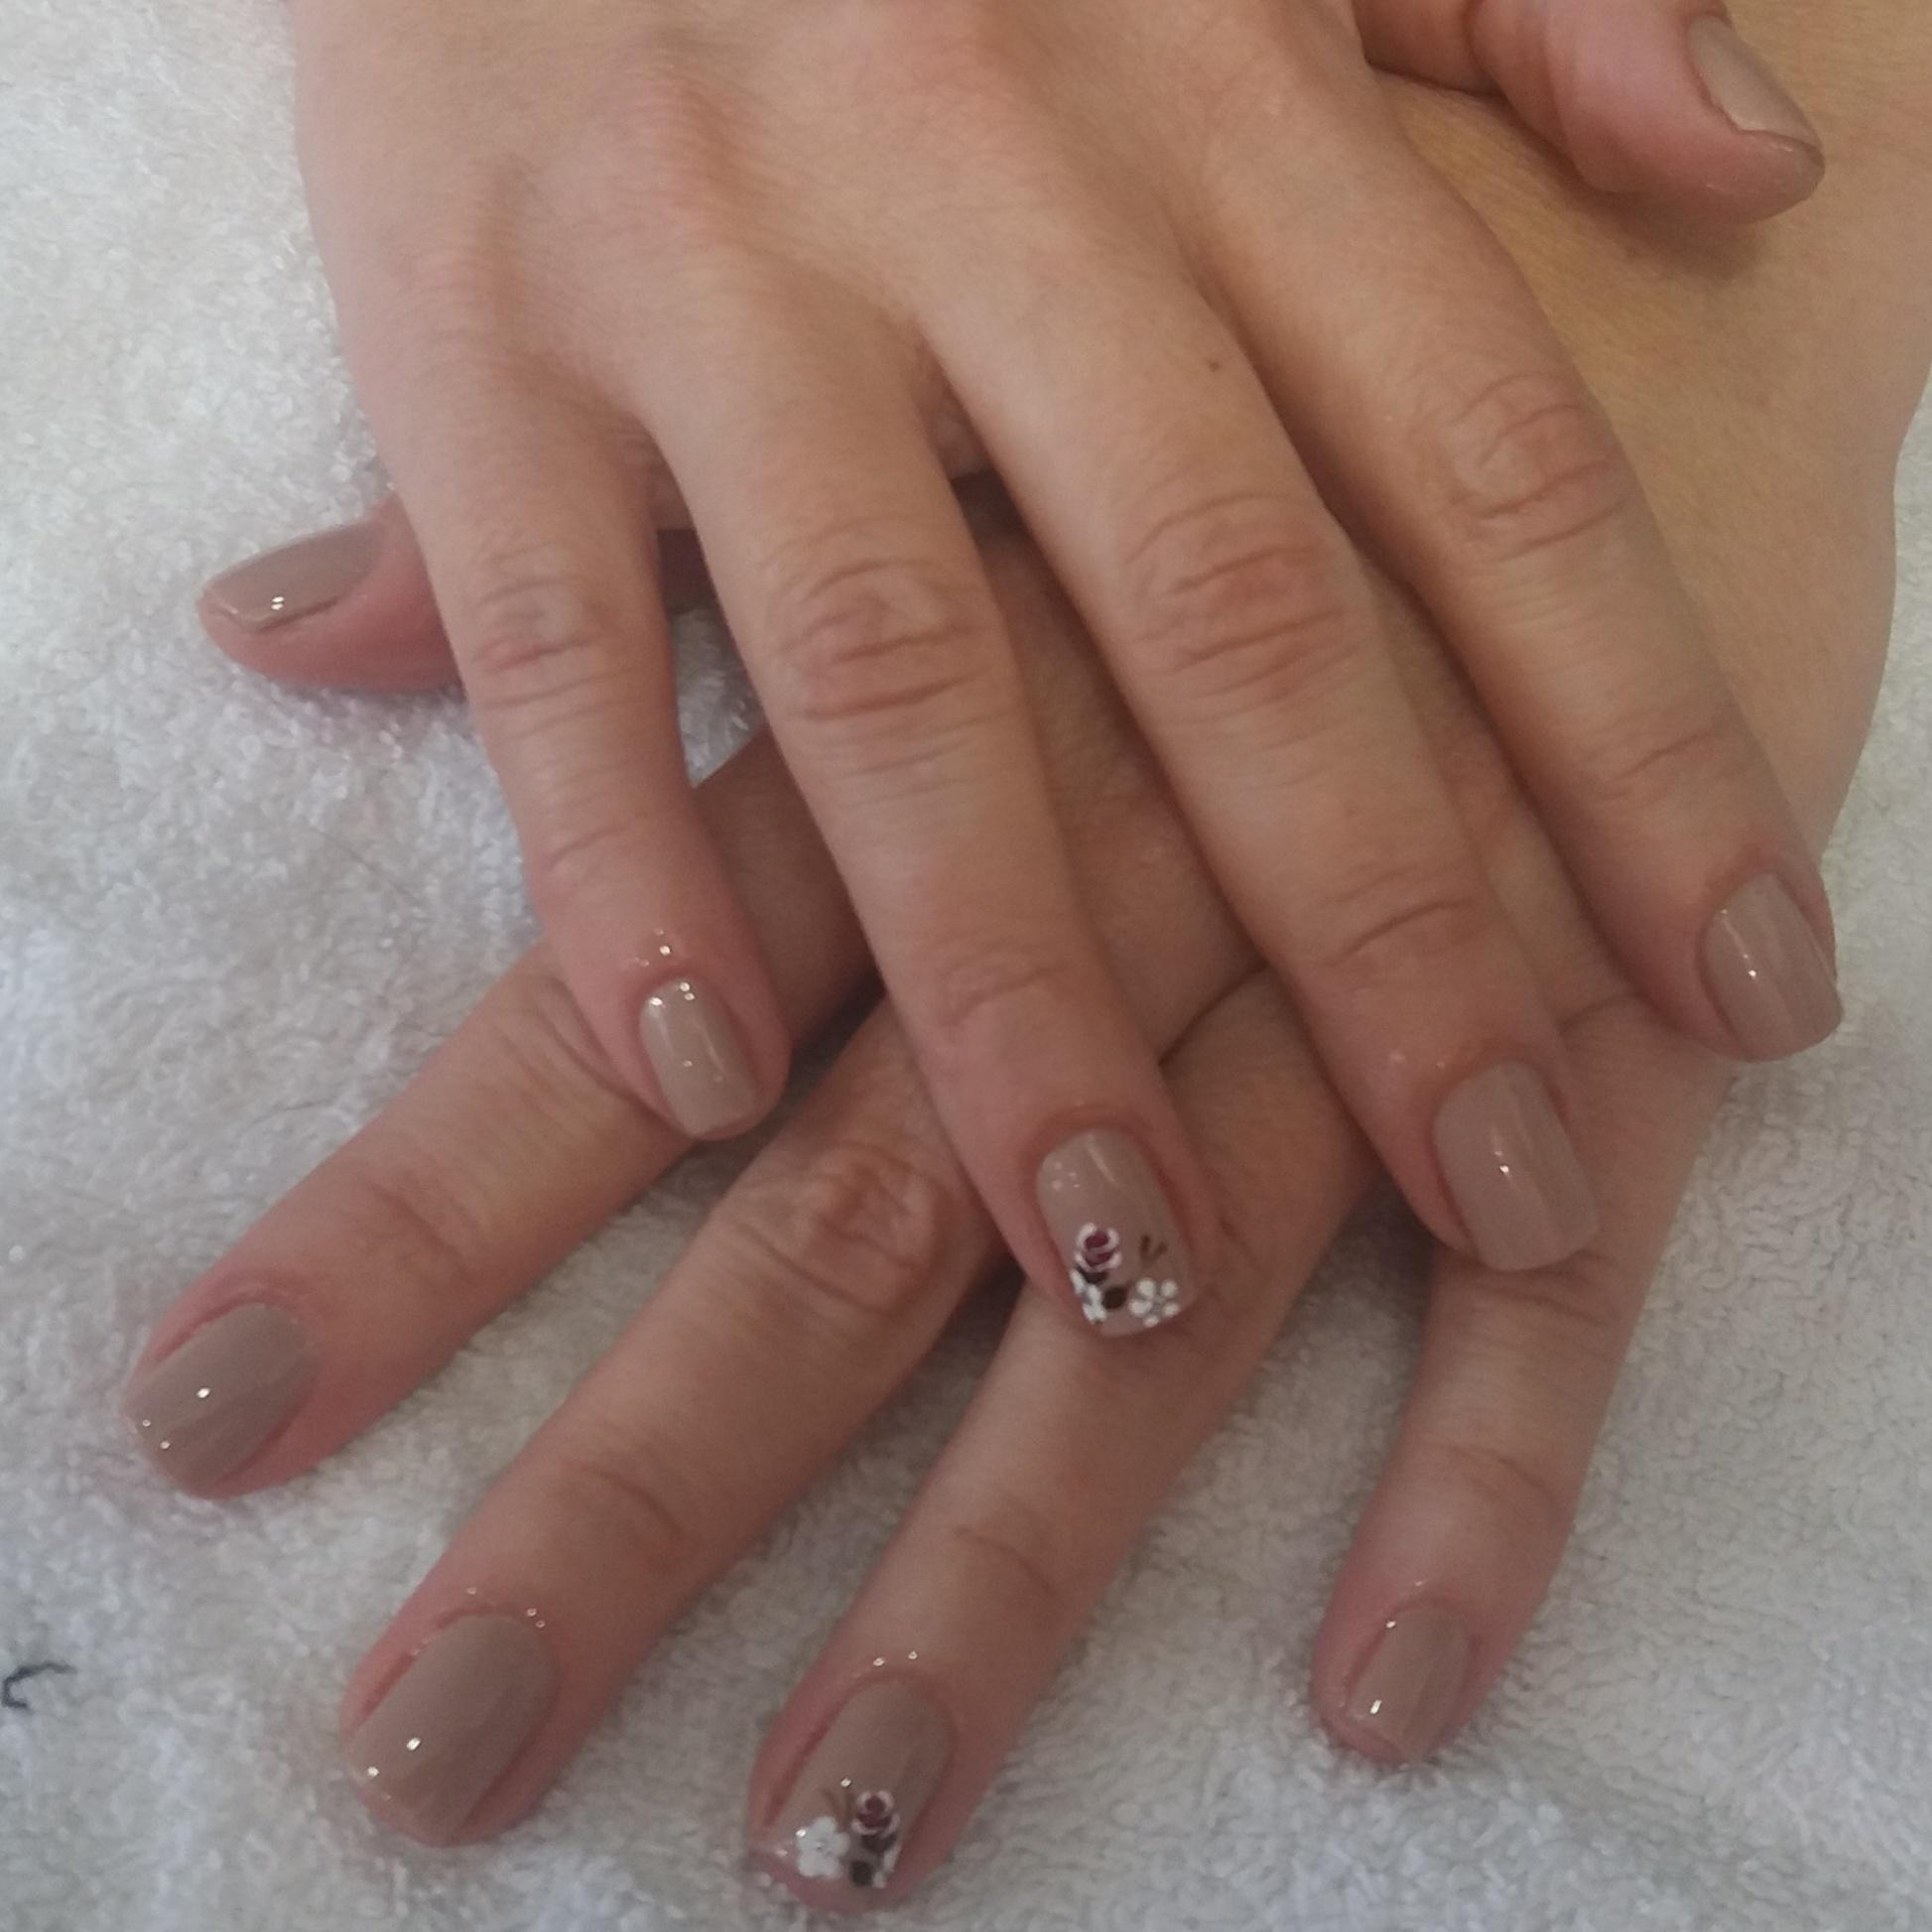 unha esteticista docente / professor(a) manicure e pedicure maquiador(a) micropigmentador(a) cosmetólogo(a) aromaterapeuta